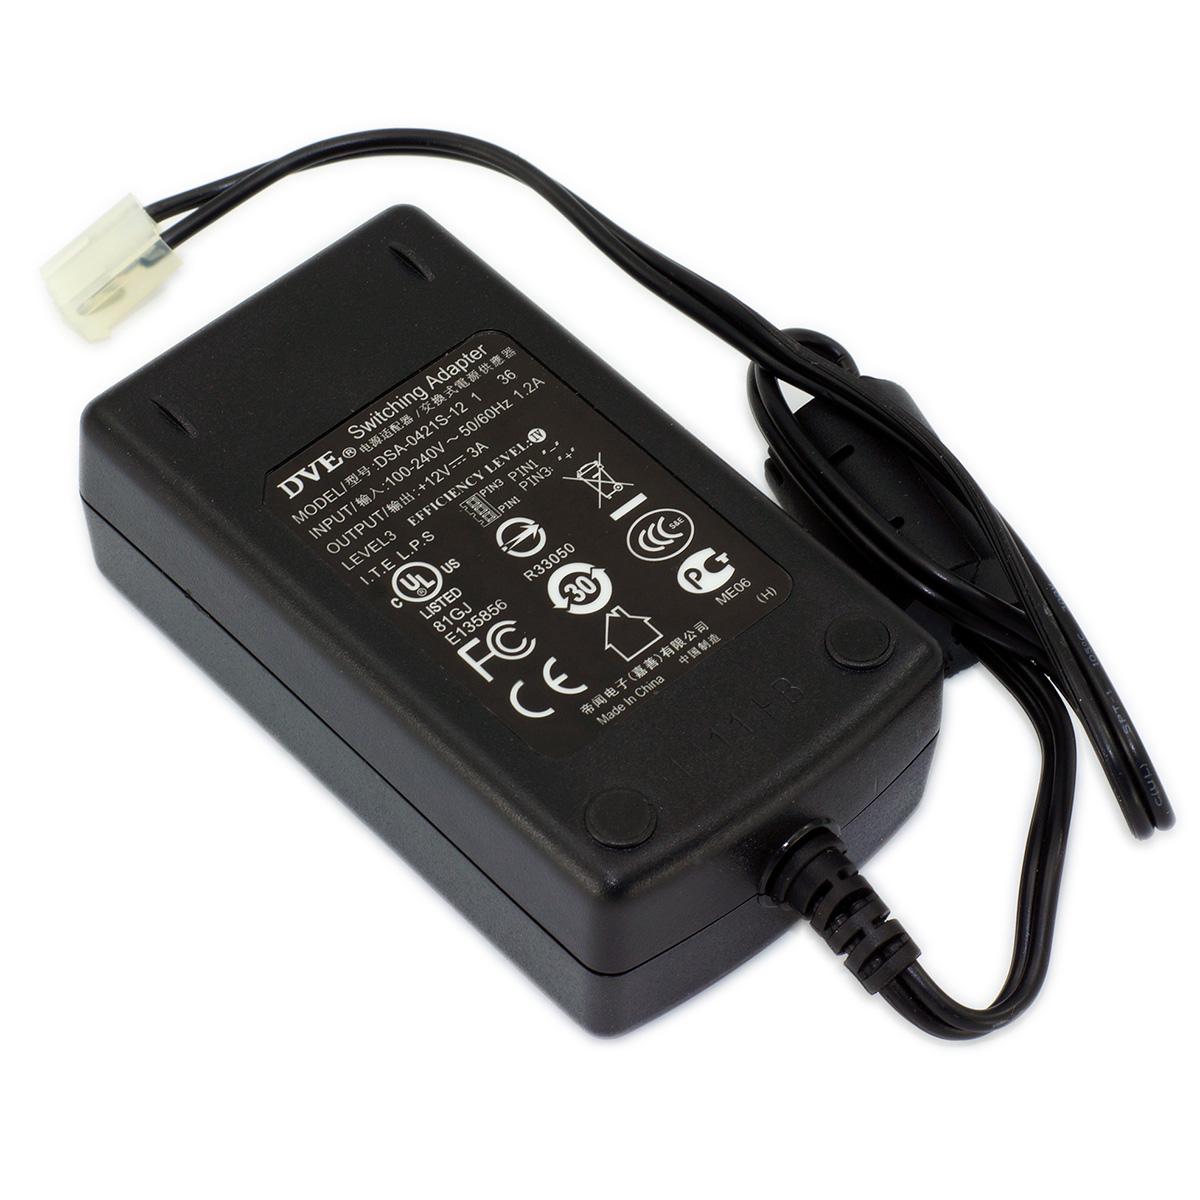 Dve 12vdc 36 Watt 3 Amp Desktop Style Switching Power Supply With Rb1100ahx2 Dsa 0421s 12 1 Bottom